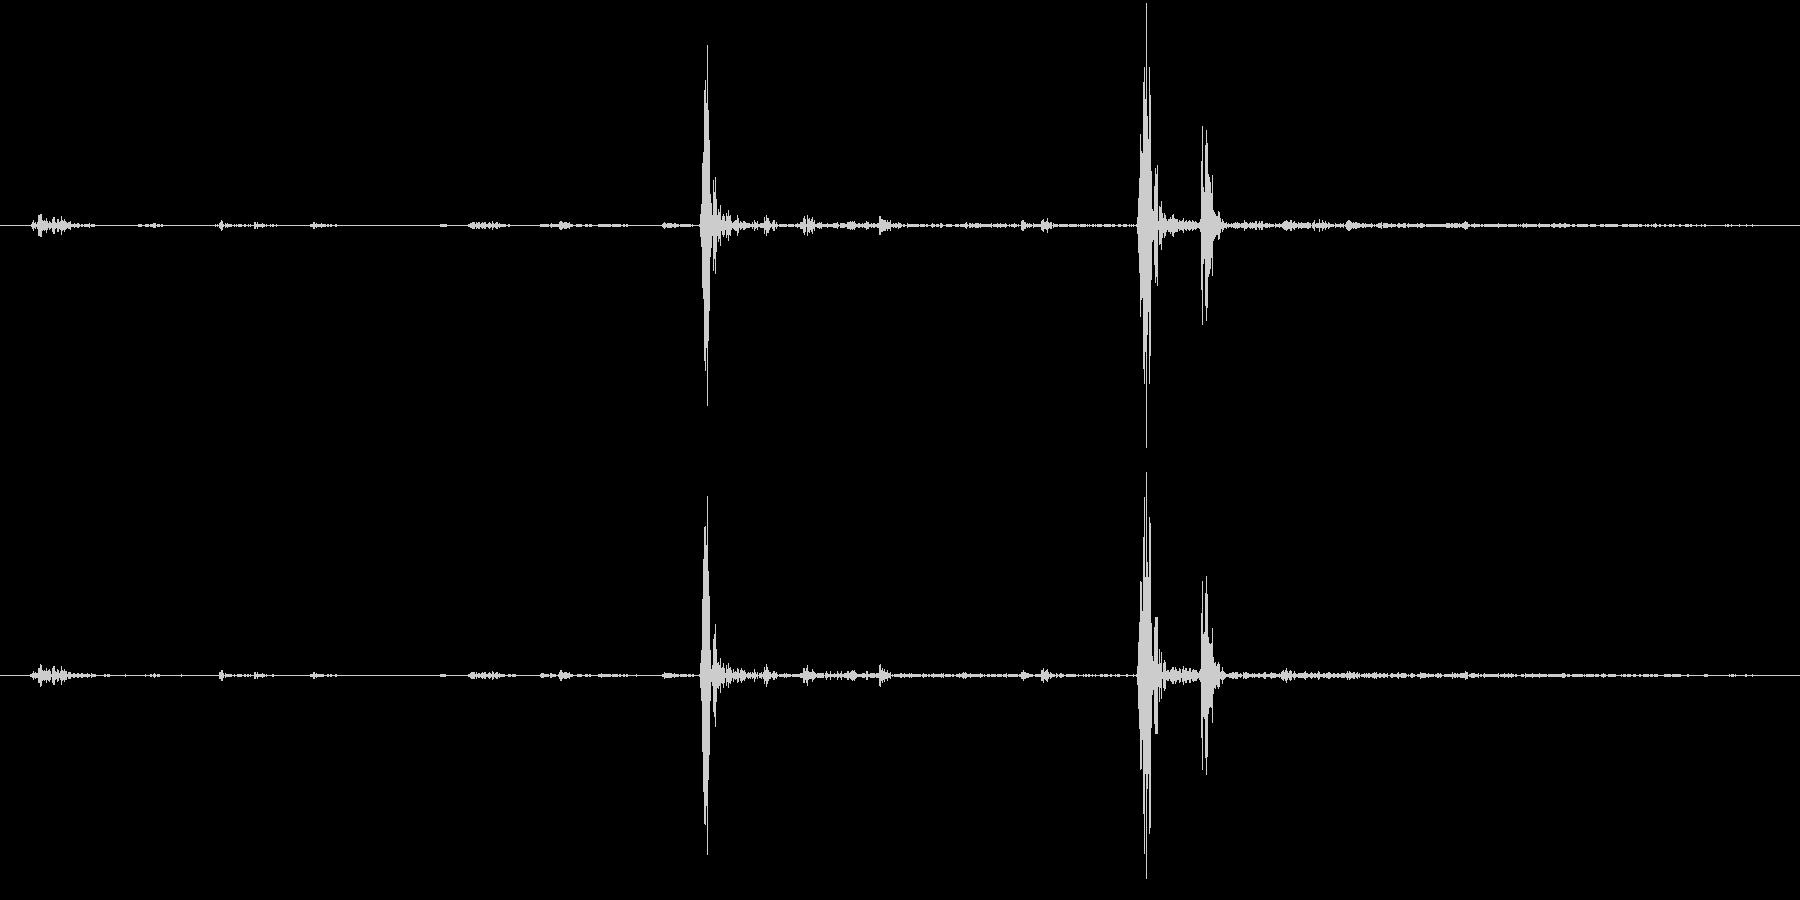 Anime 指の関節を鳴らす音 5の未再生の波形